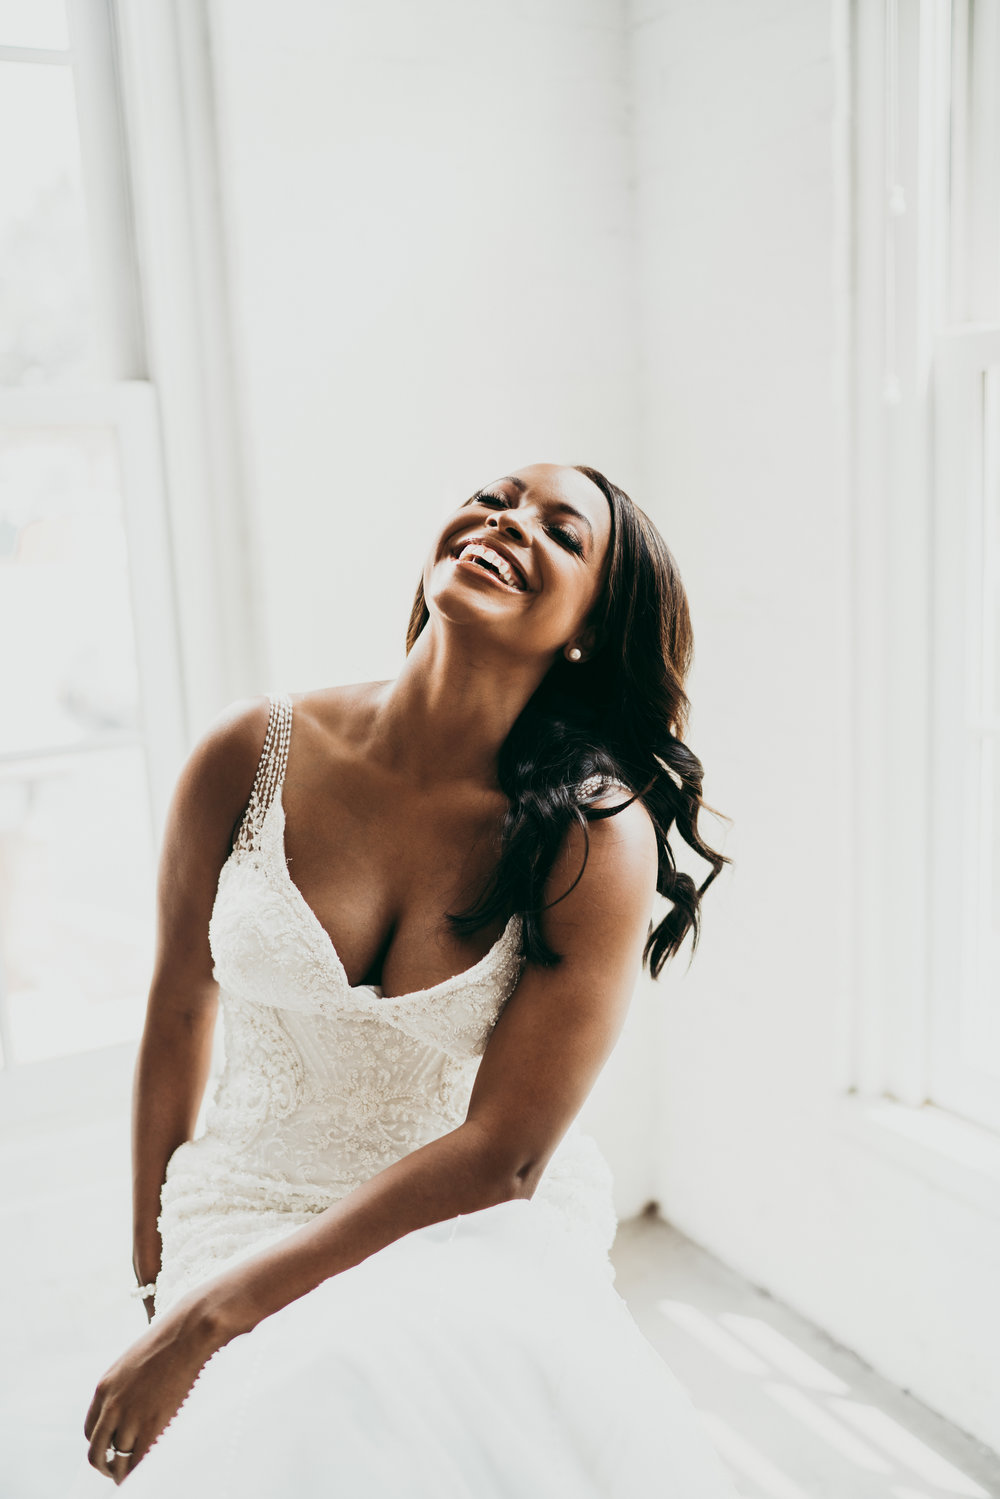 TheCoordinatedBride_Destinys-Bridal-Portraits_Ryan-Barnett_DSC05397.jpg